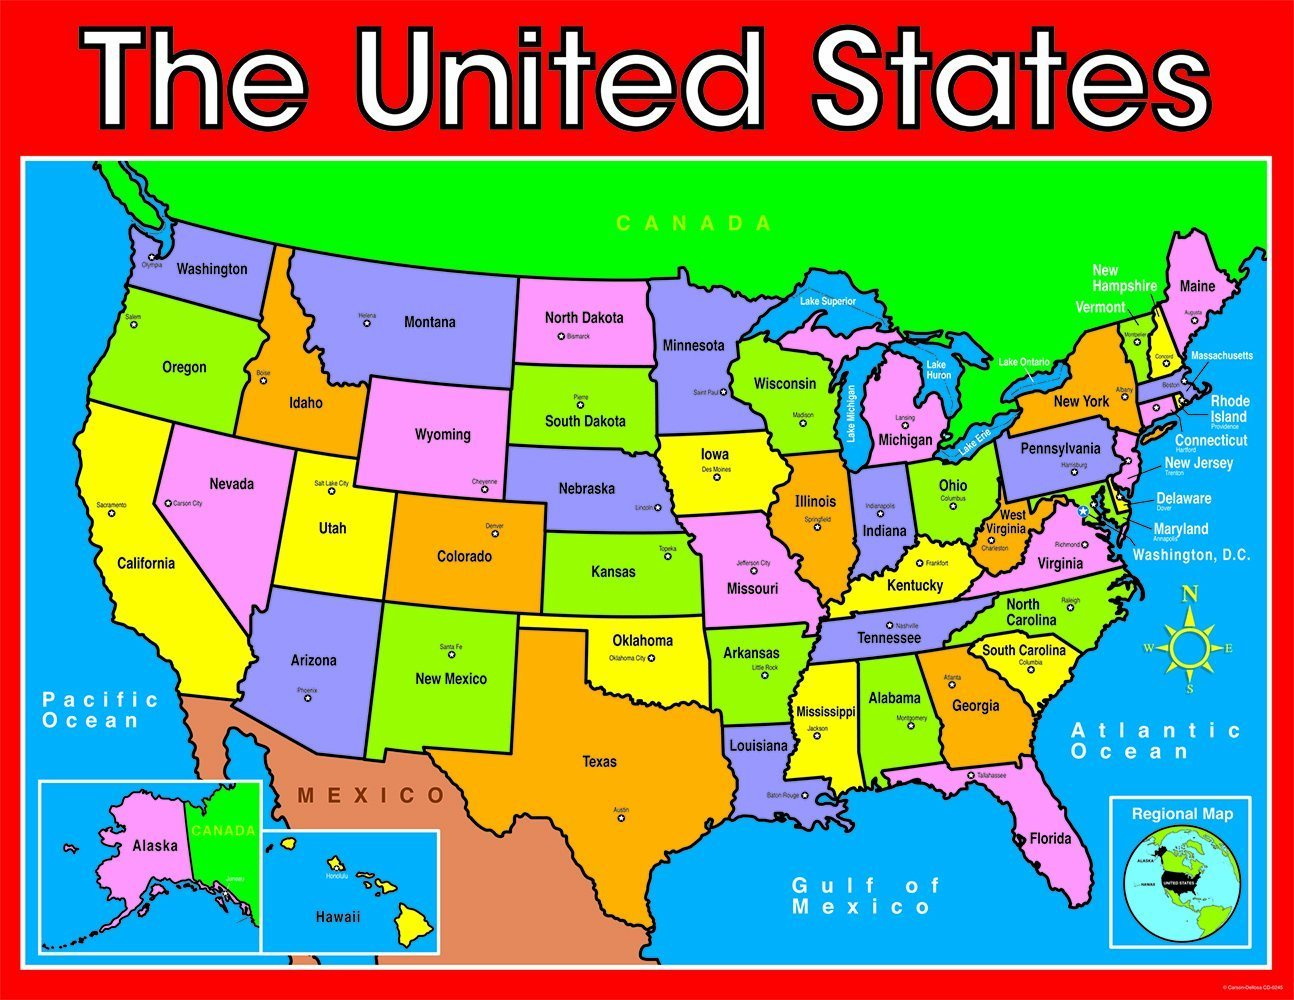 Cd 6245 The United States Map Chart American Studies Educators - Us-map-chart